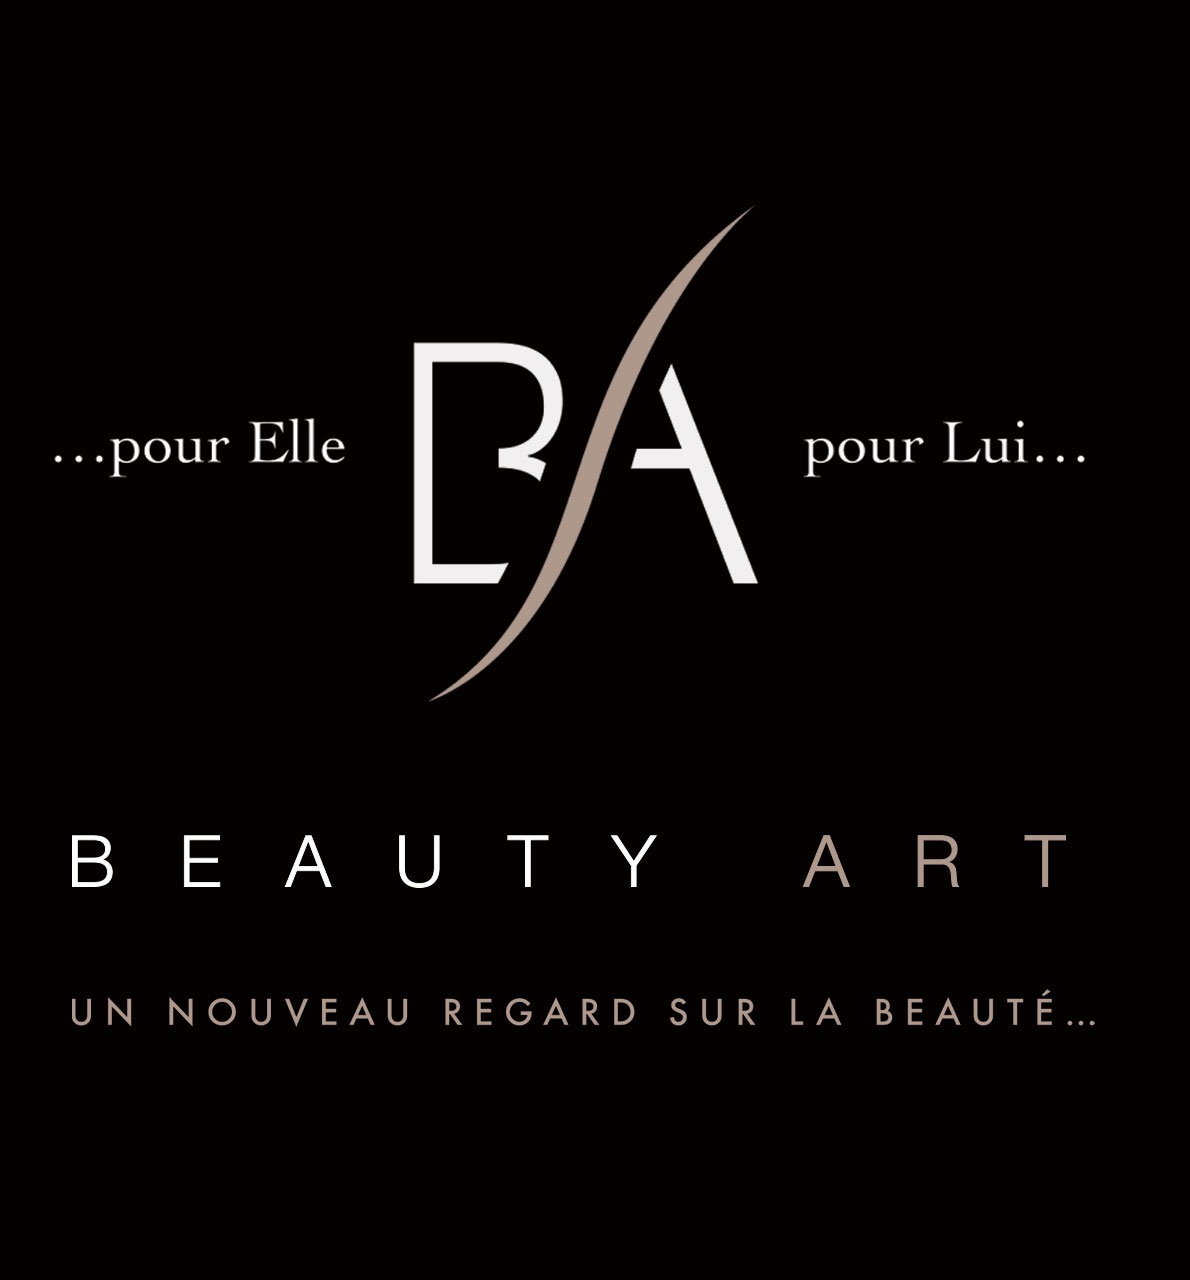 Tarifs Institut de beauté Montpellier